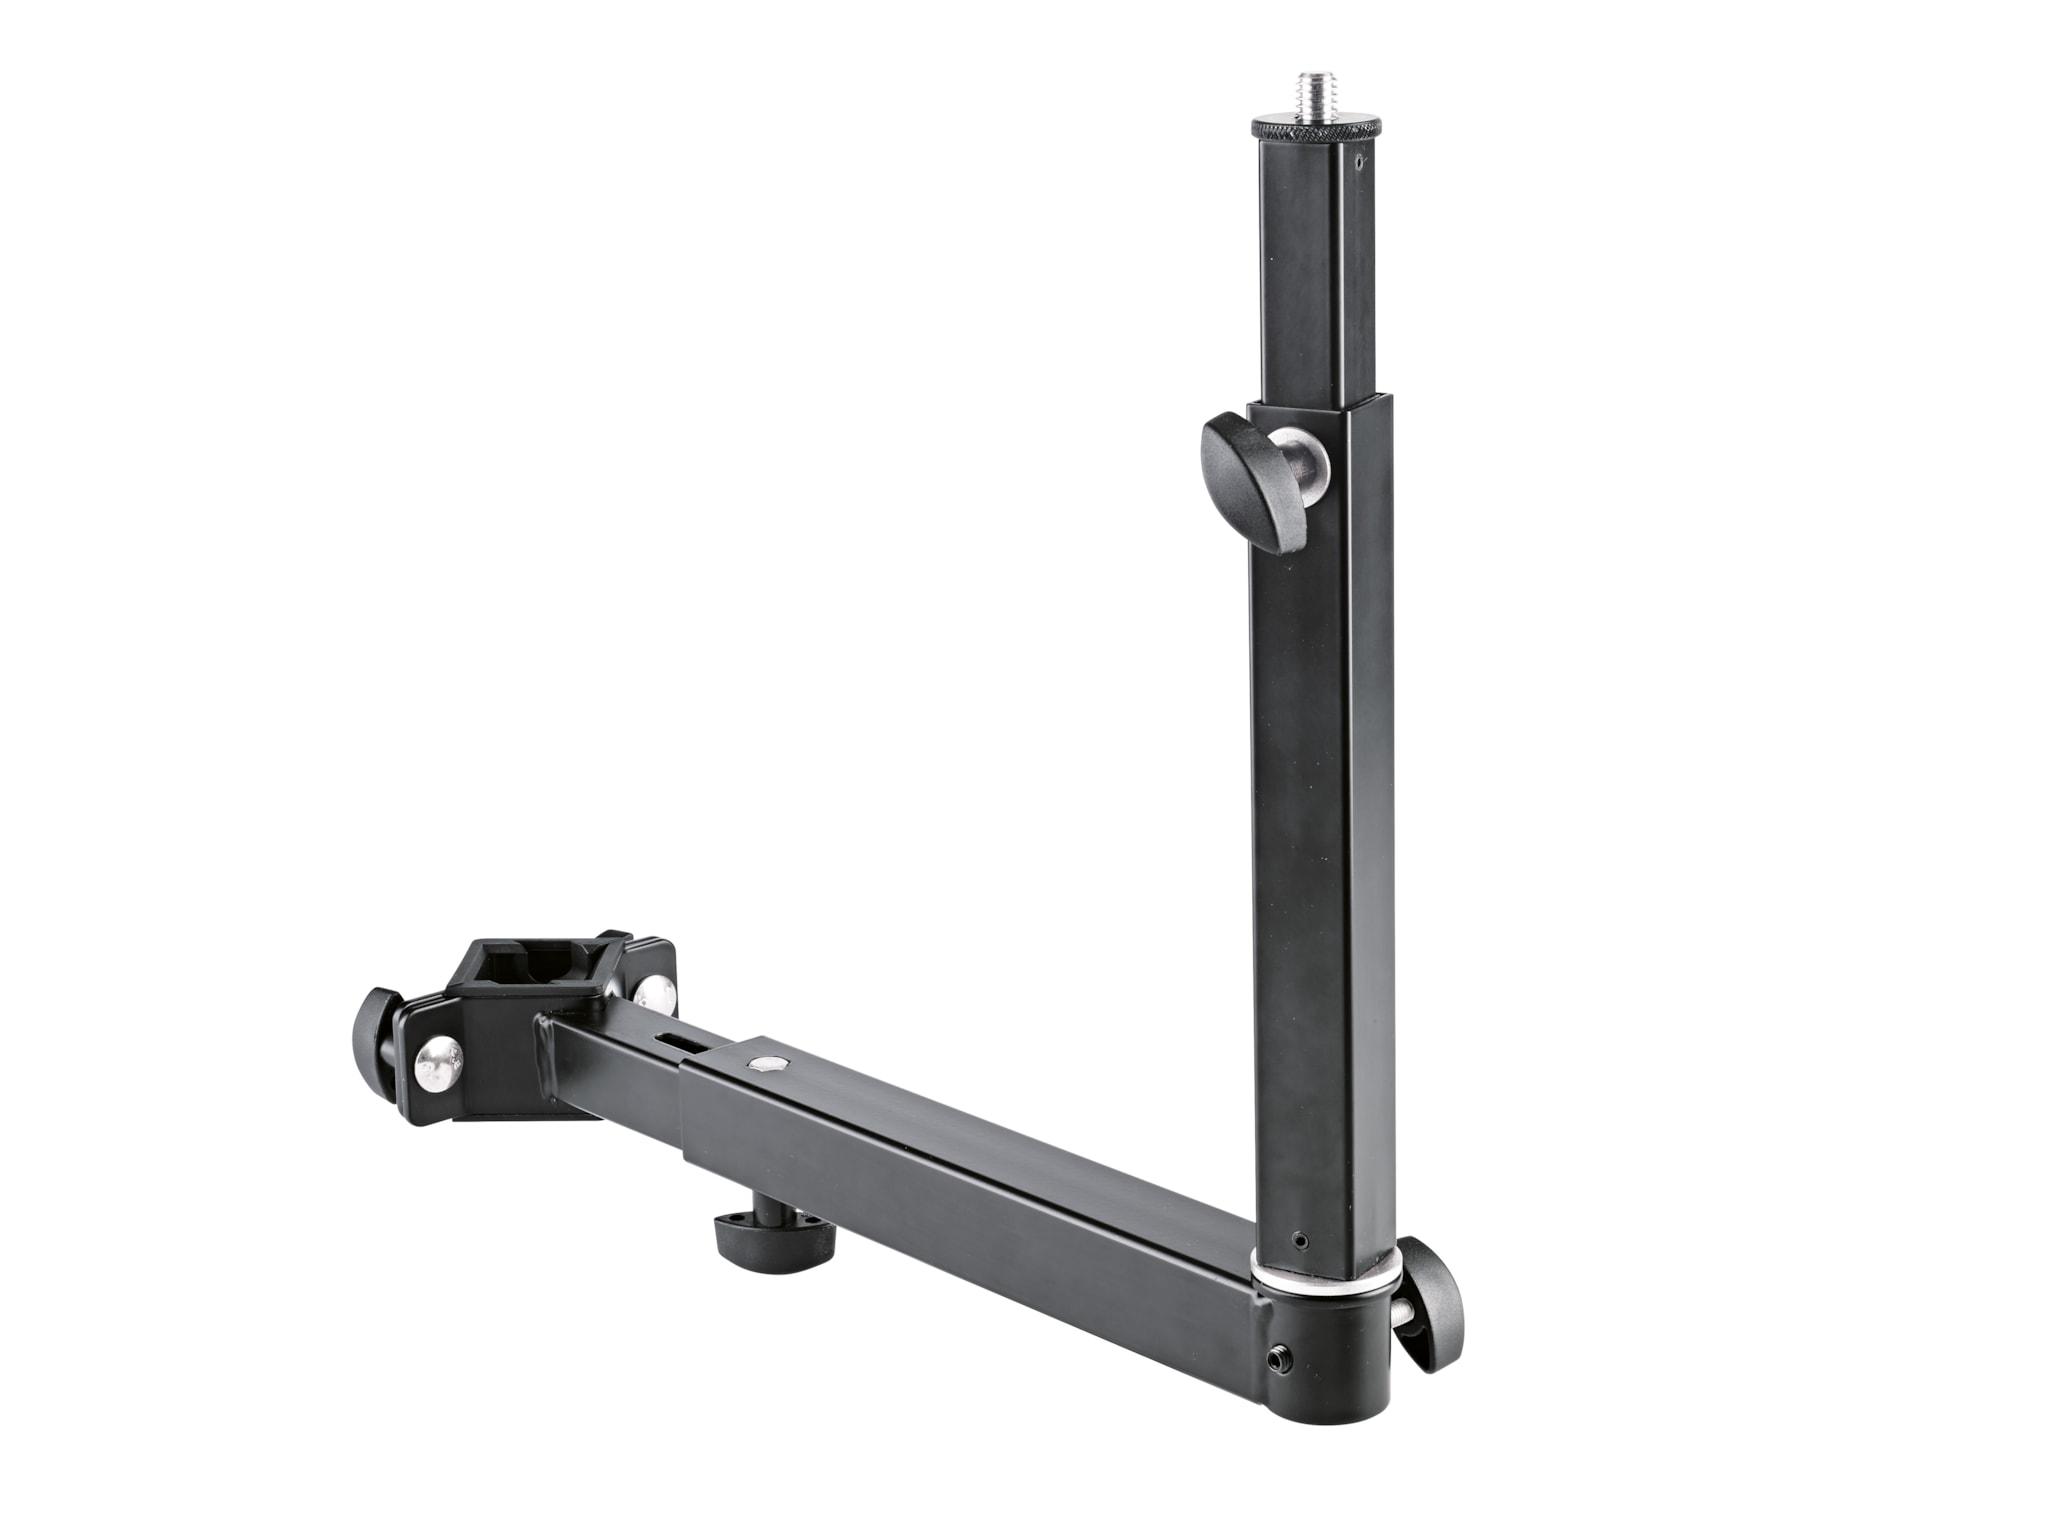 KM18807 - Universal holder